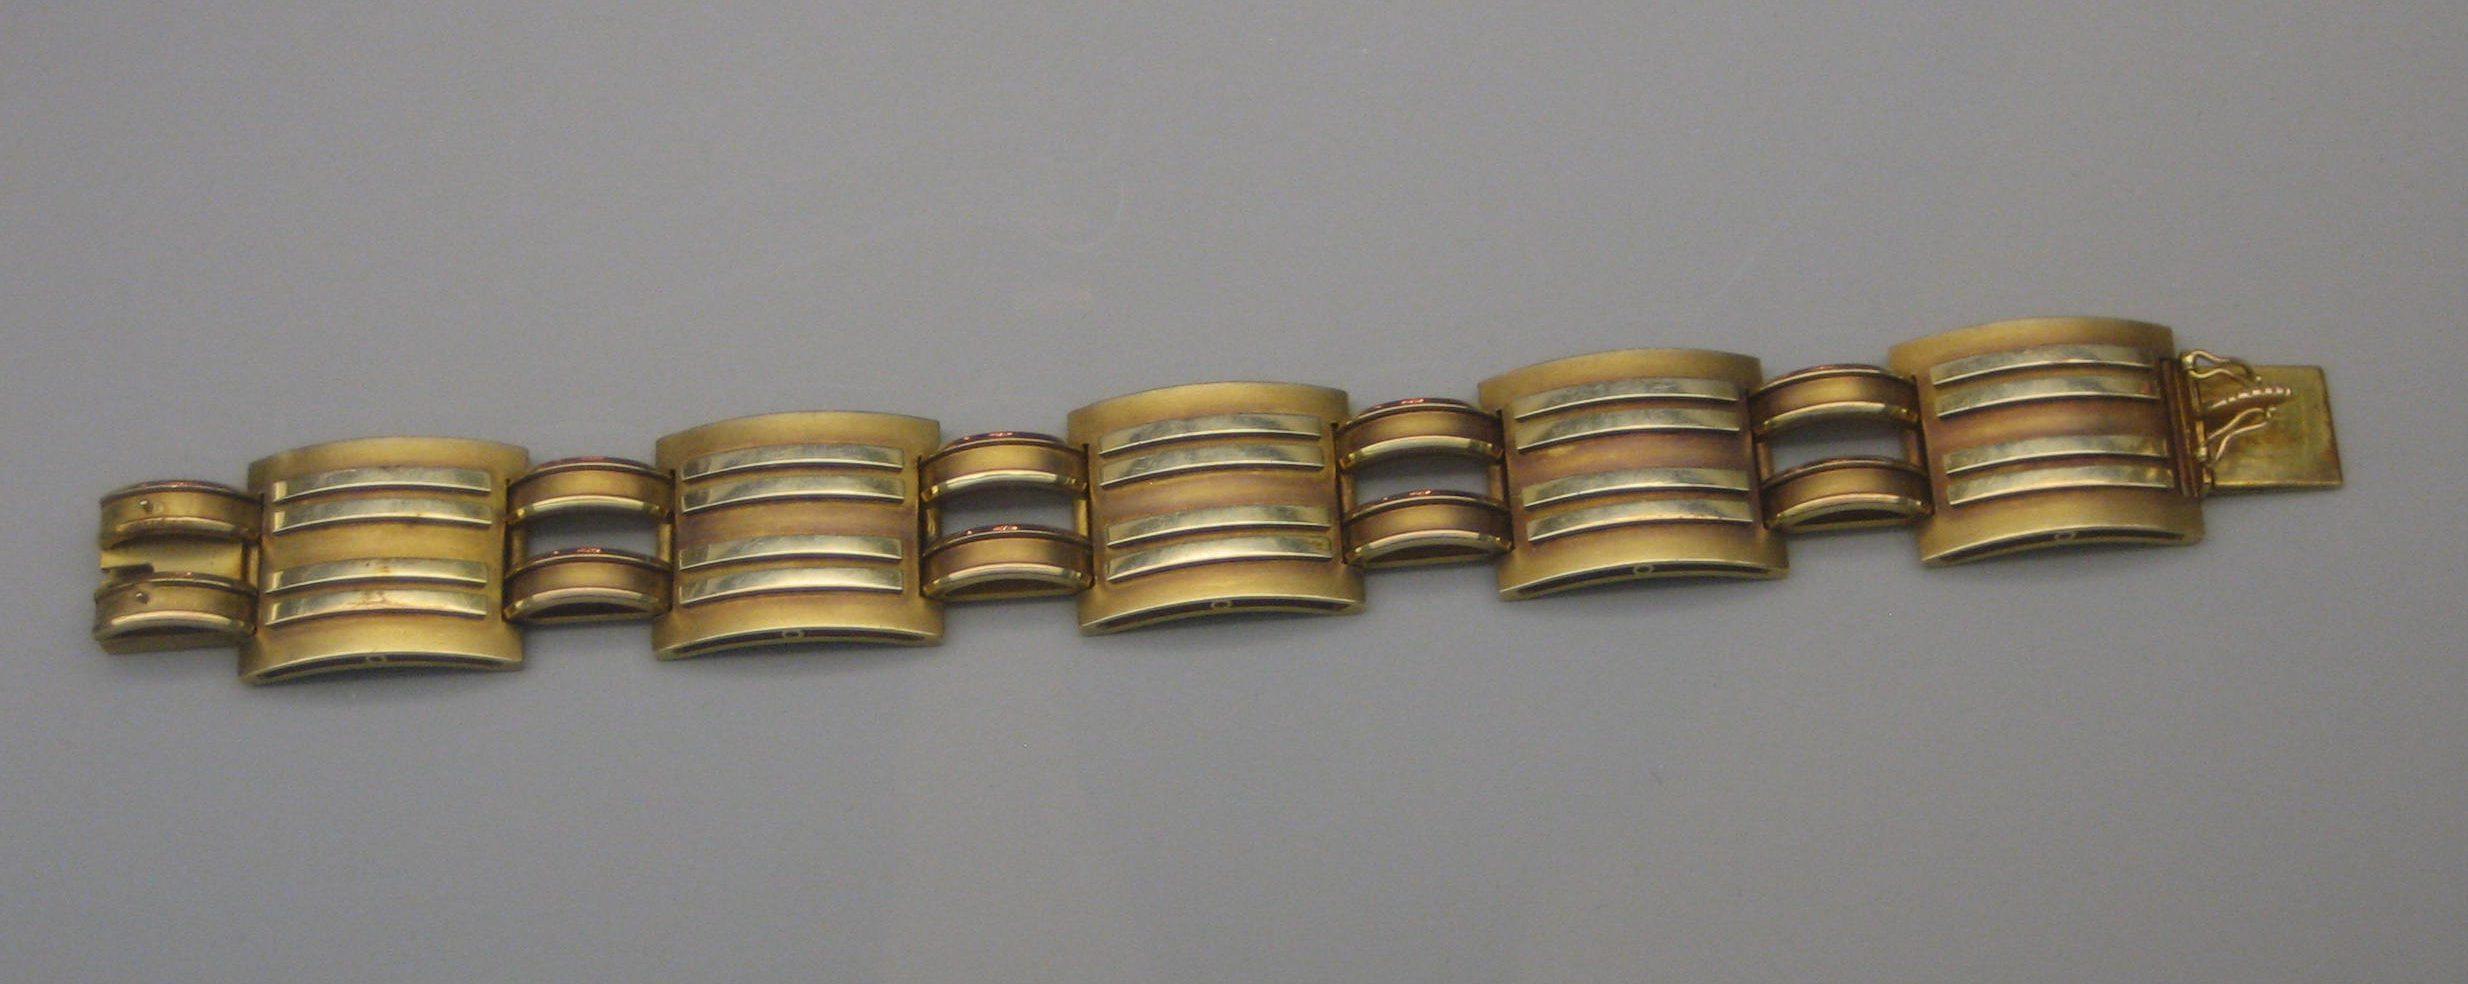 Willi Stoll, armband, circa 1935. Collectie Grassimuseum. Foto Esther Doornbusch, mei 2018, CC BY 4.0